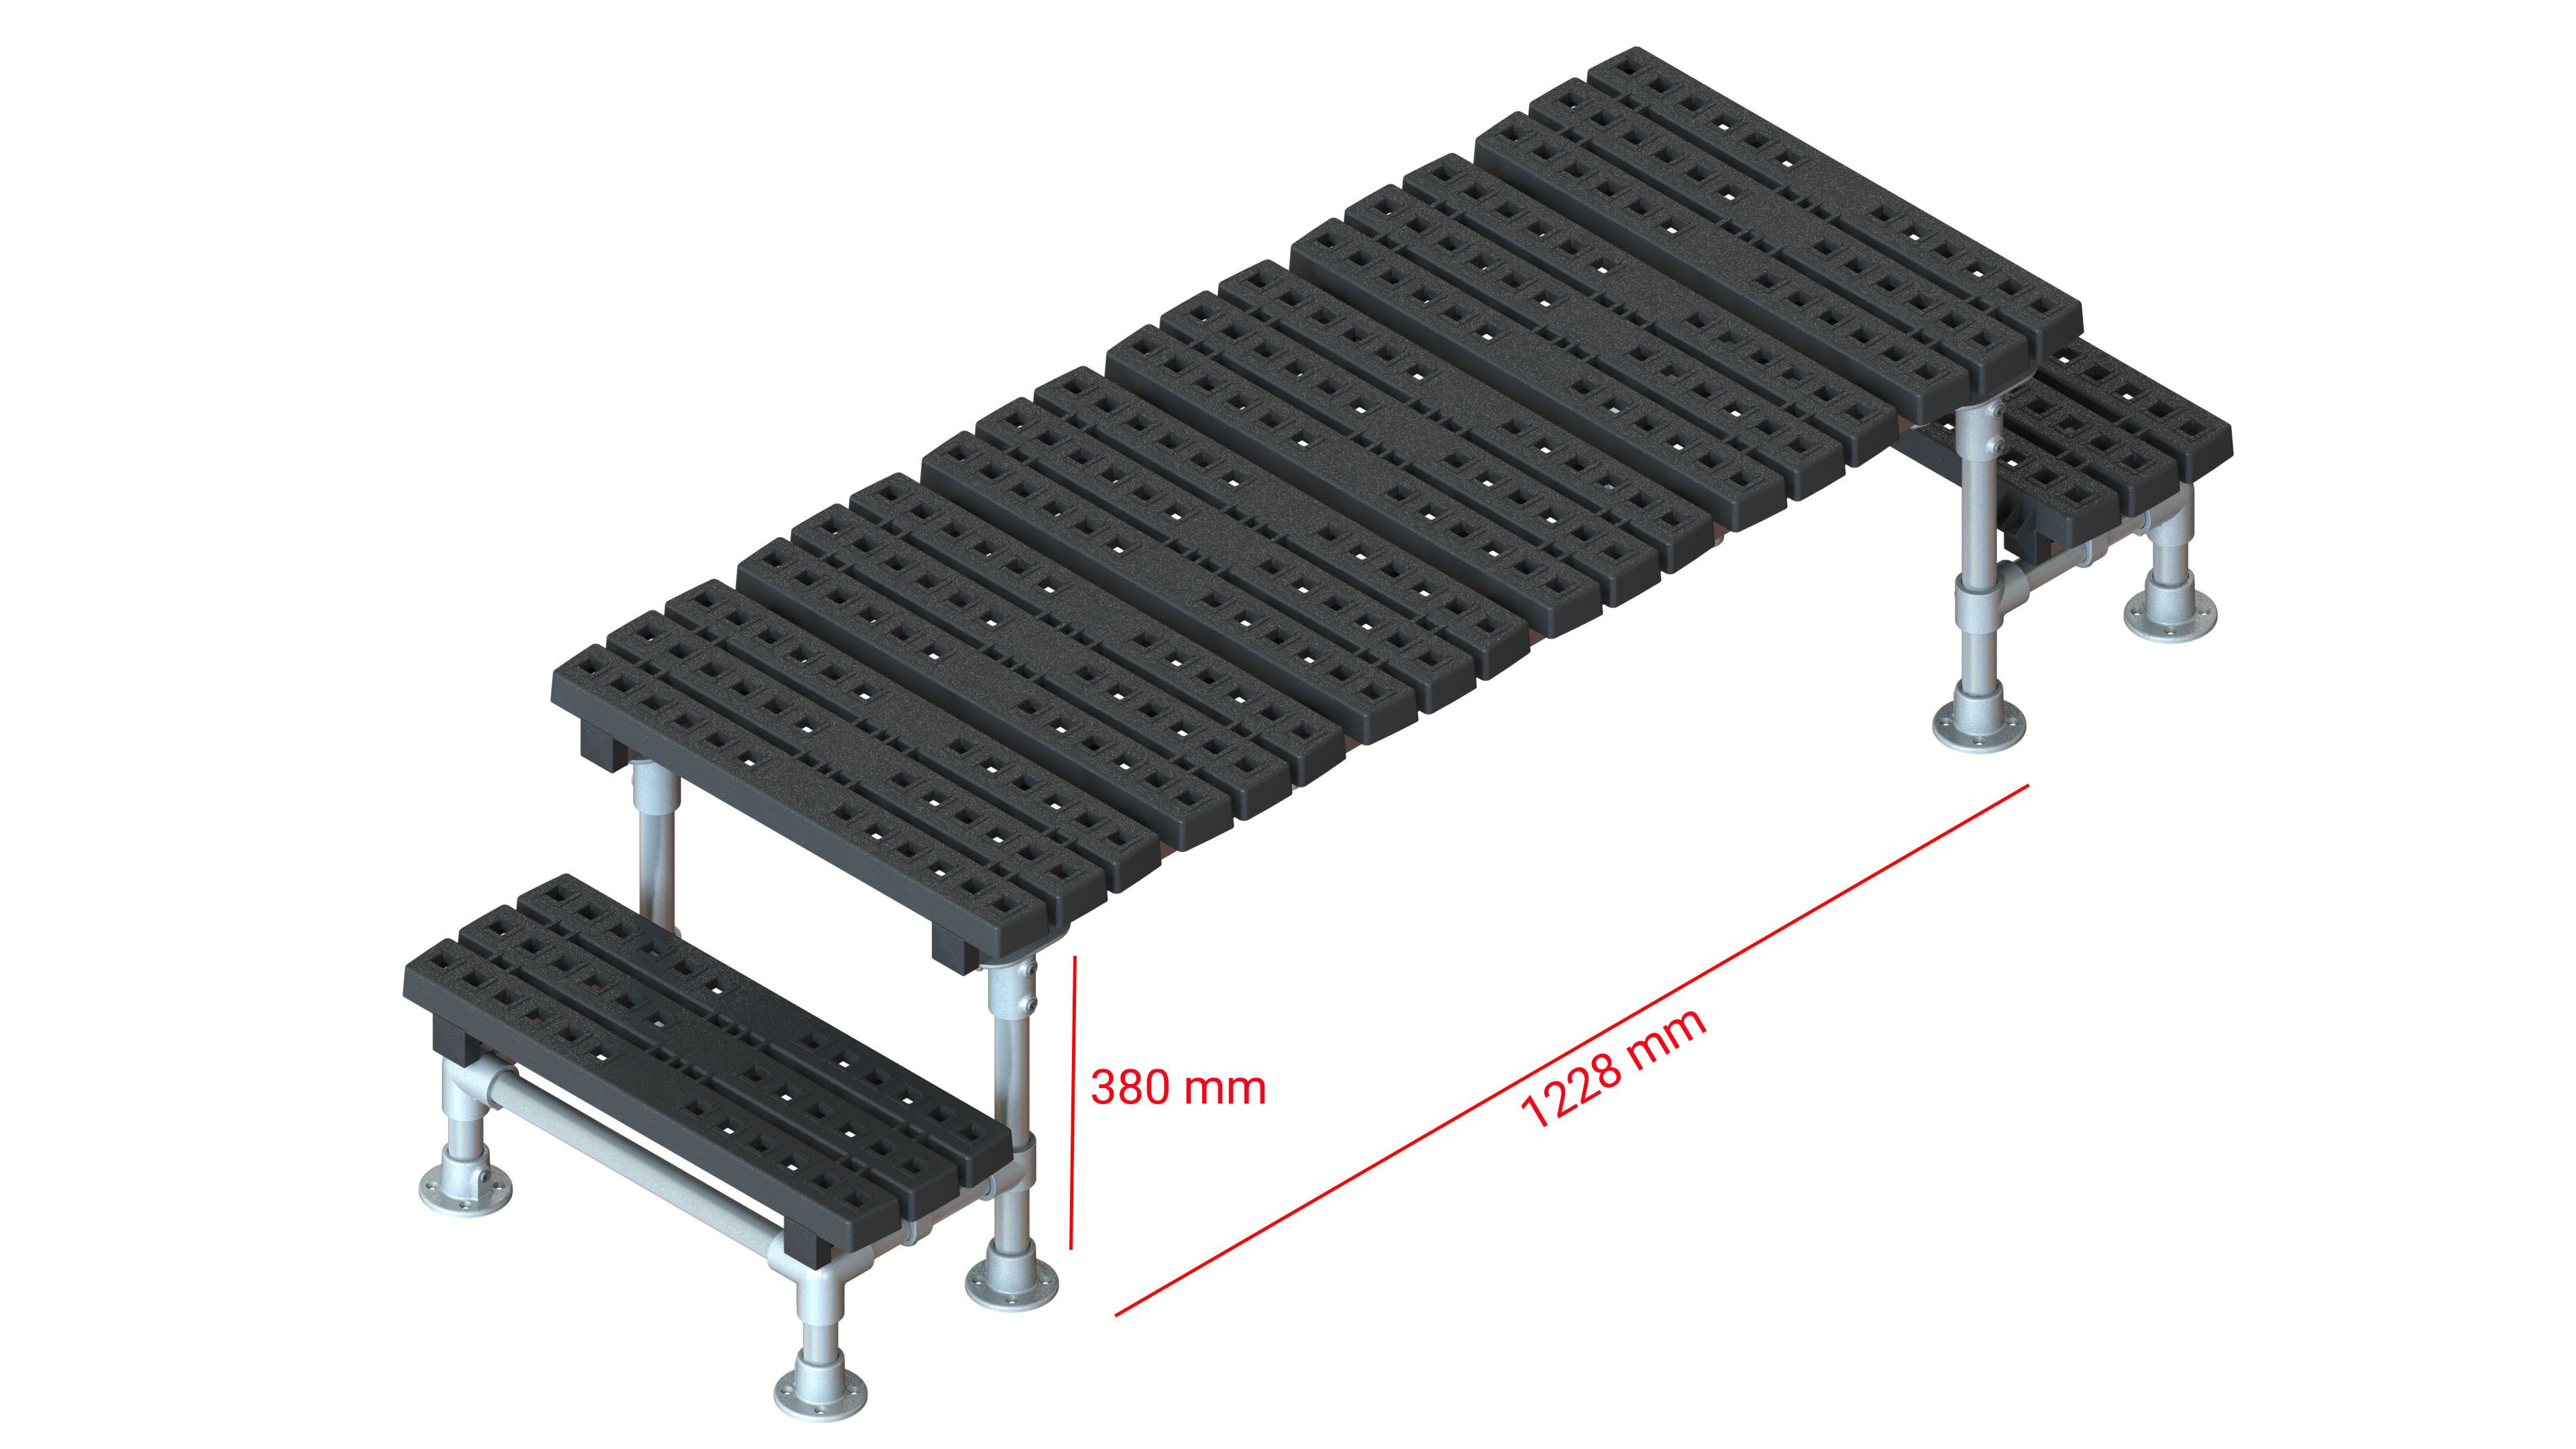 Mini step-over platform - Fixed, 380x1228mm clearance